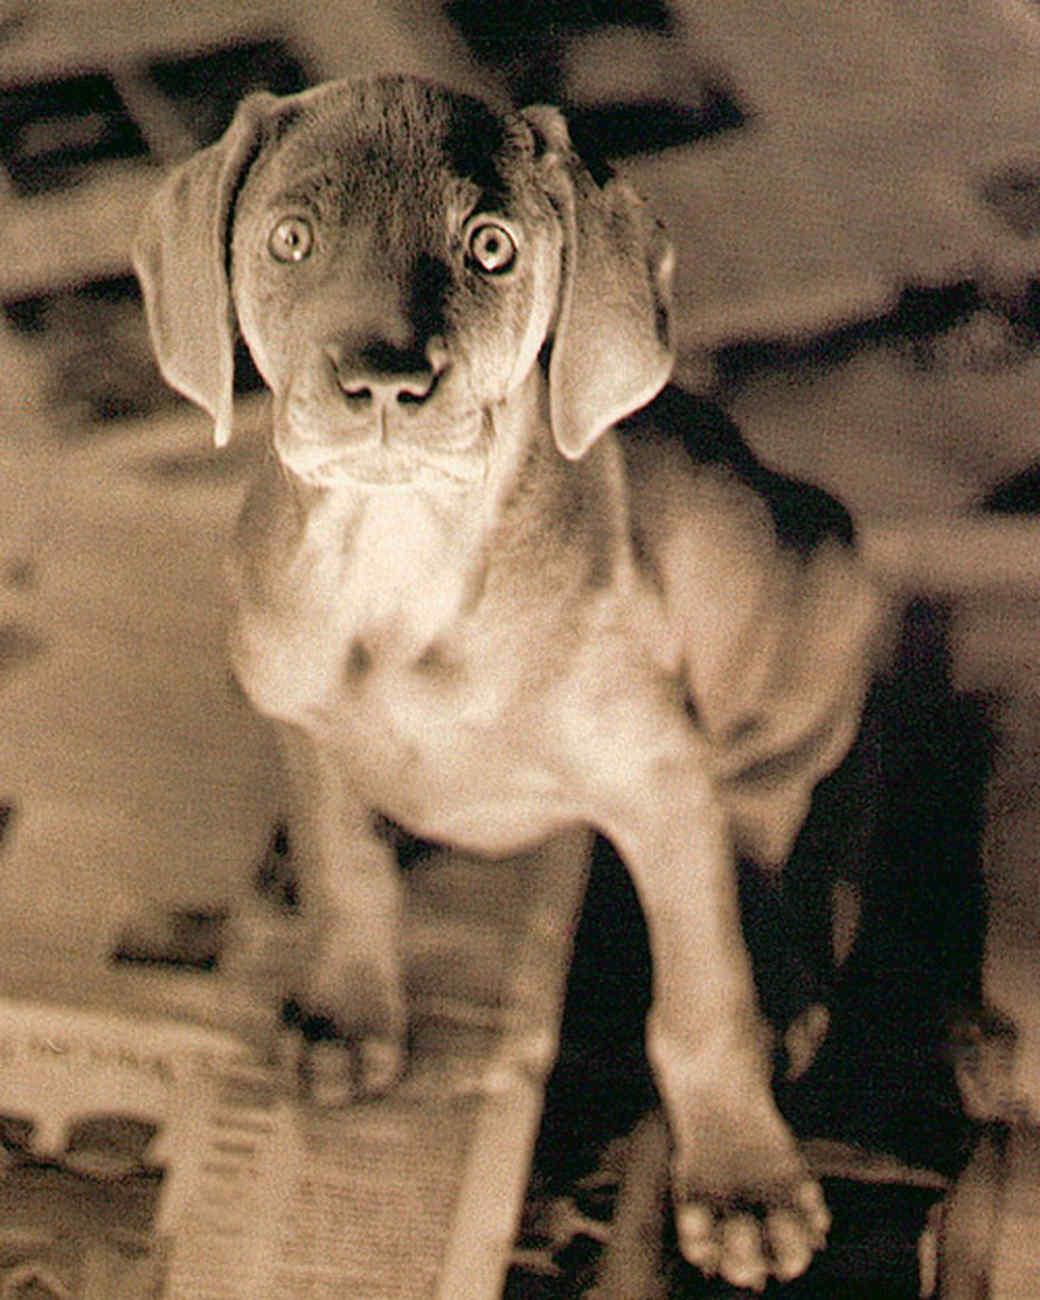 pe_training_puppy1.jpg